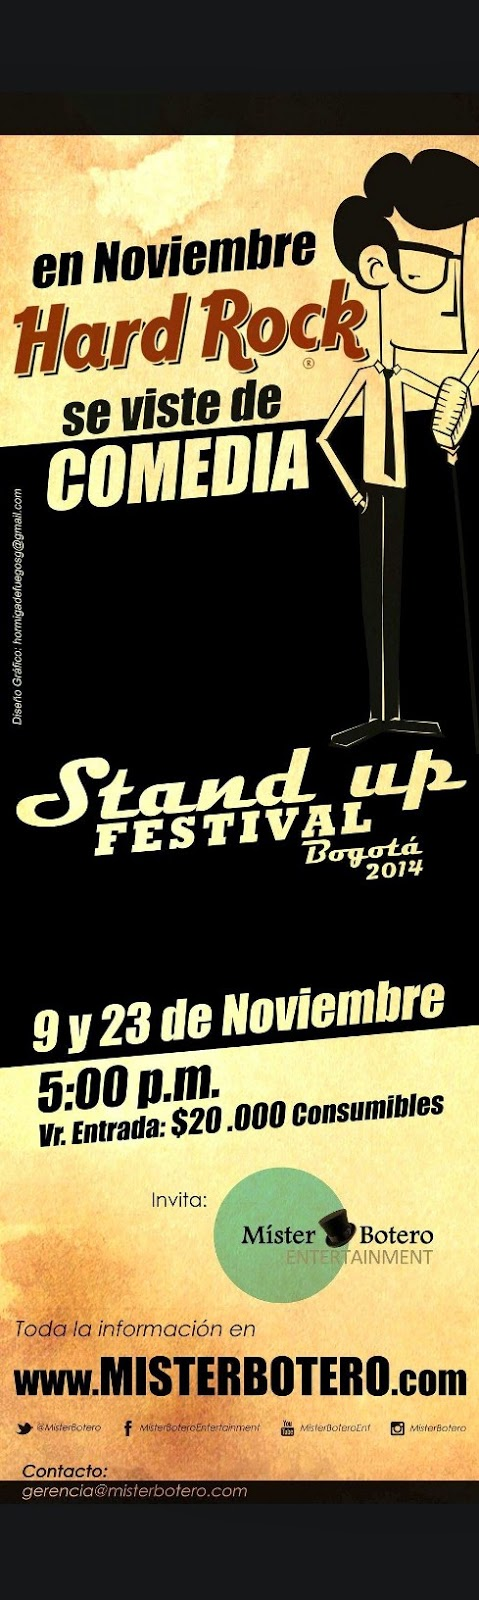 Primer-Gran-Stand-Up-Festival-Bogotá-2014